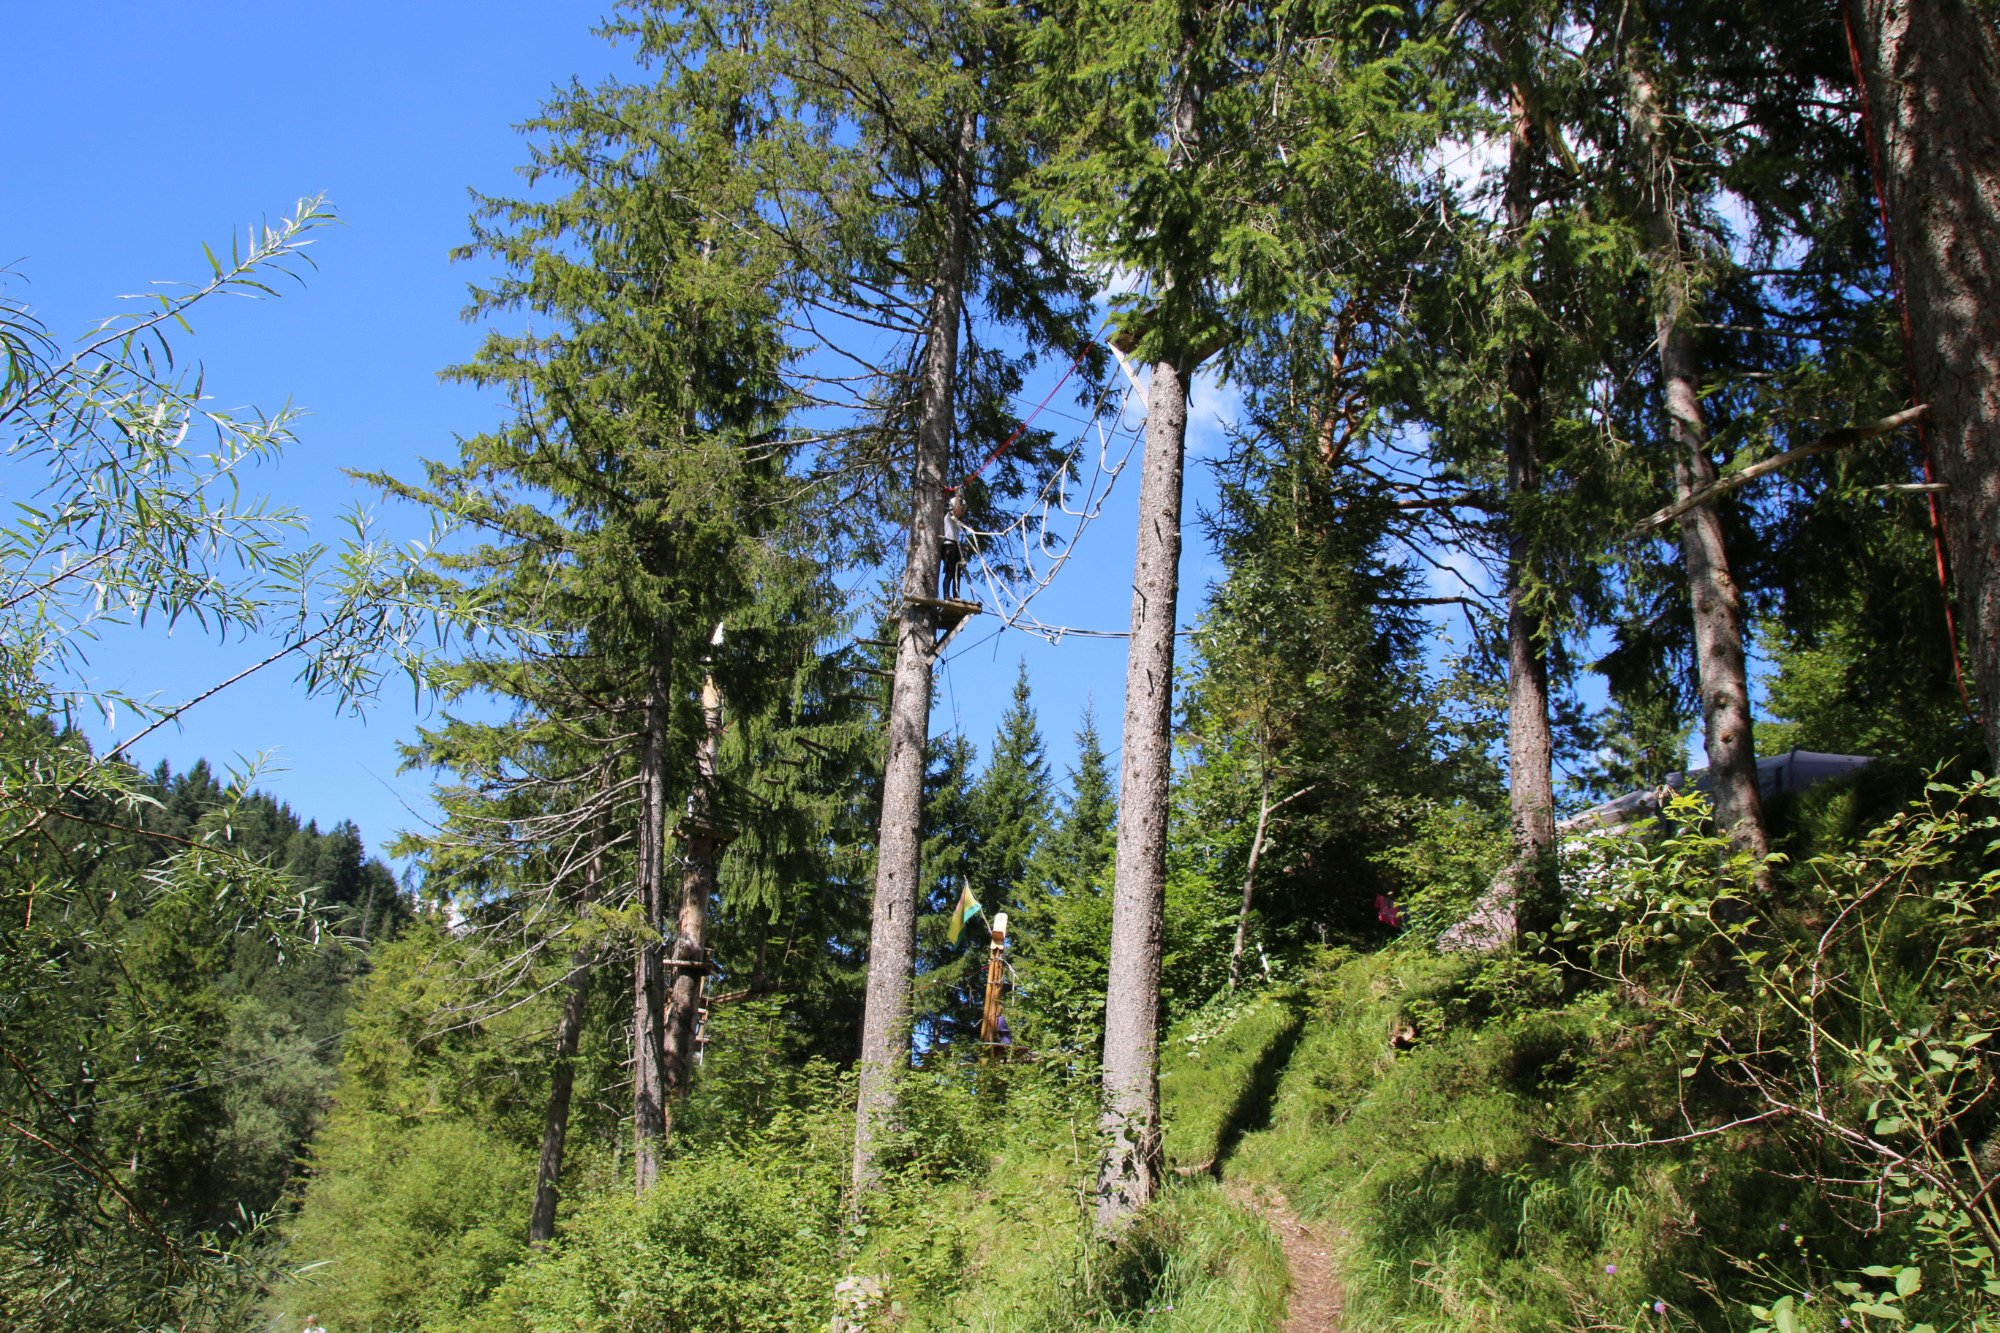 Naturcamping Isarhorn